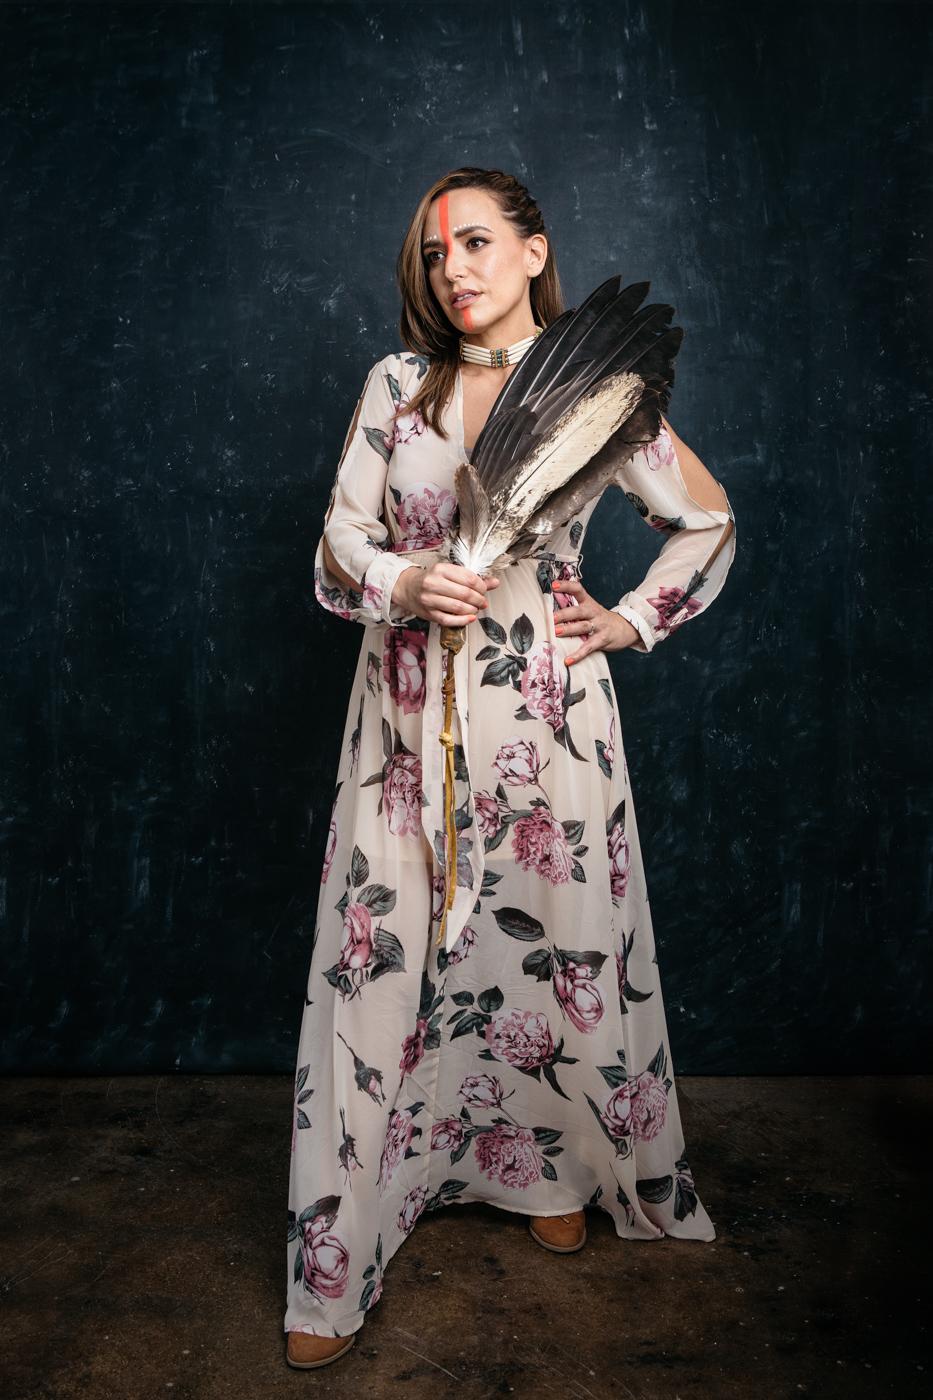 AprilEveWiberg-Edmonton-WomenOfVision-Studio-Portrait-Photography-_O6A3781-web.jpg